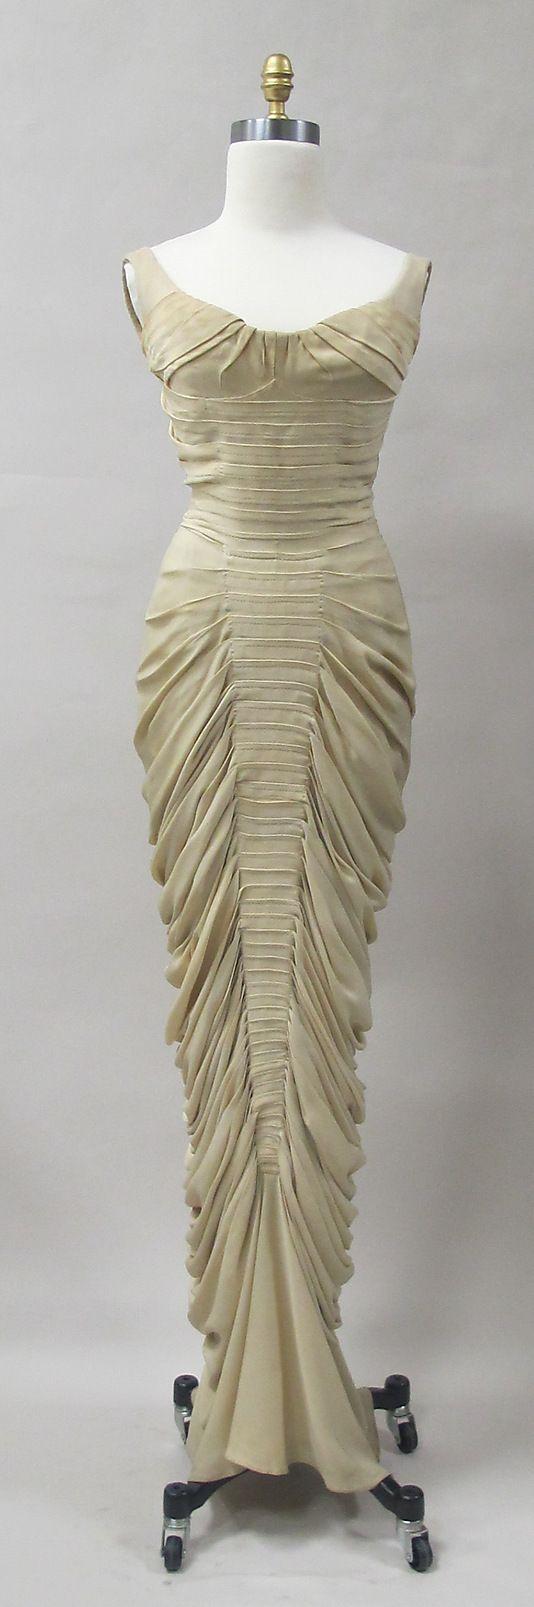 Charles James Evening Dress, c 1955